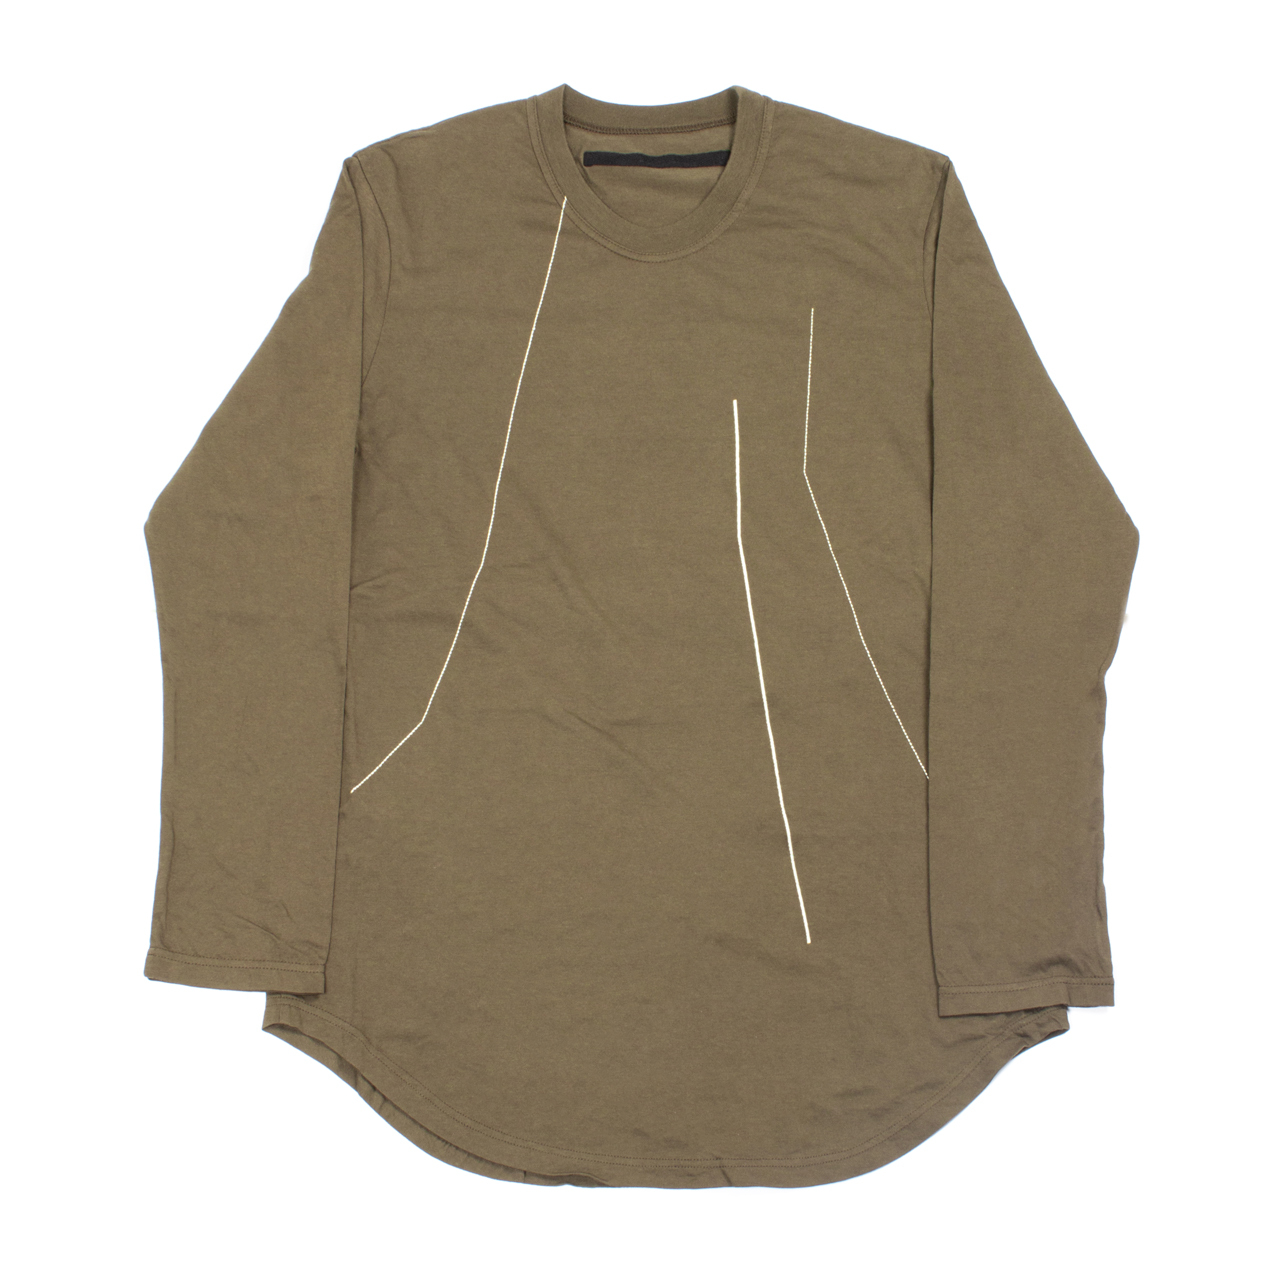 727CUM9-S-BROWN / 刺繍 ロングスリーブ Tシャツ